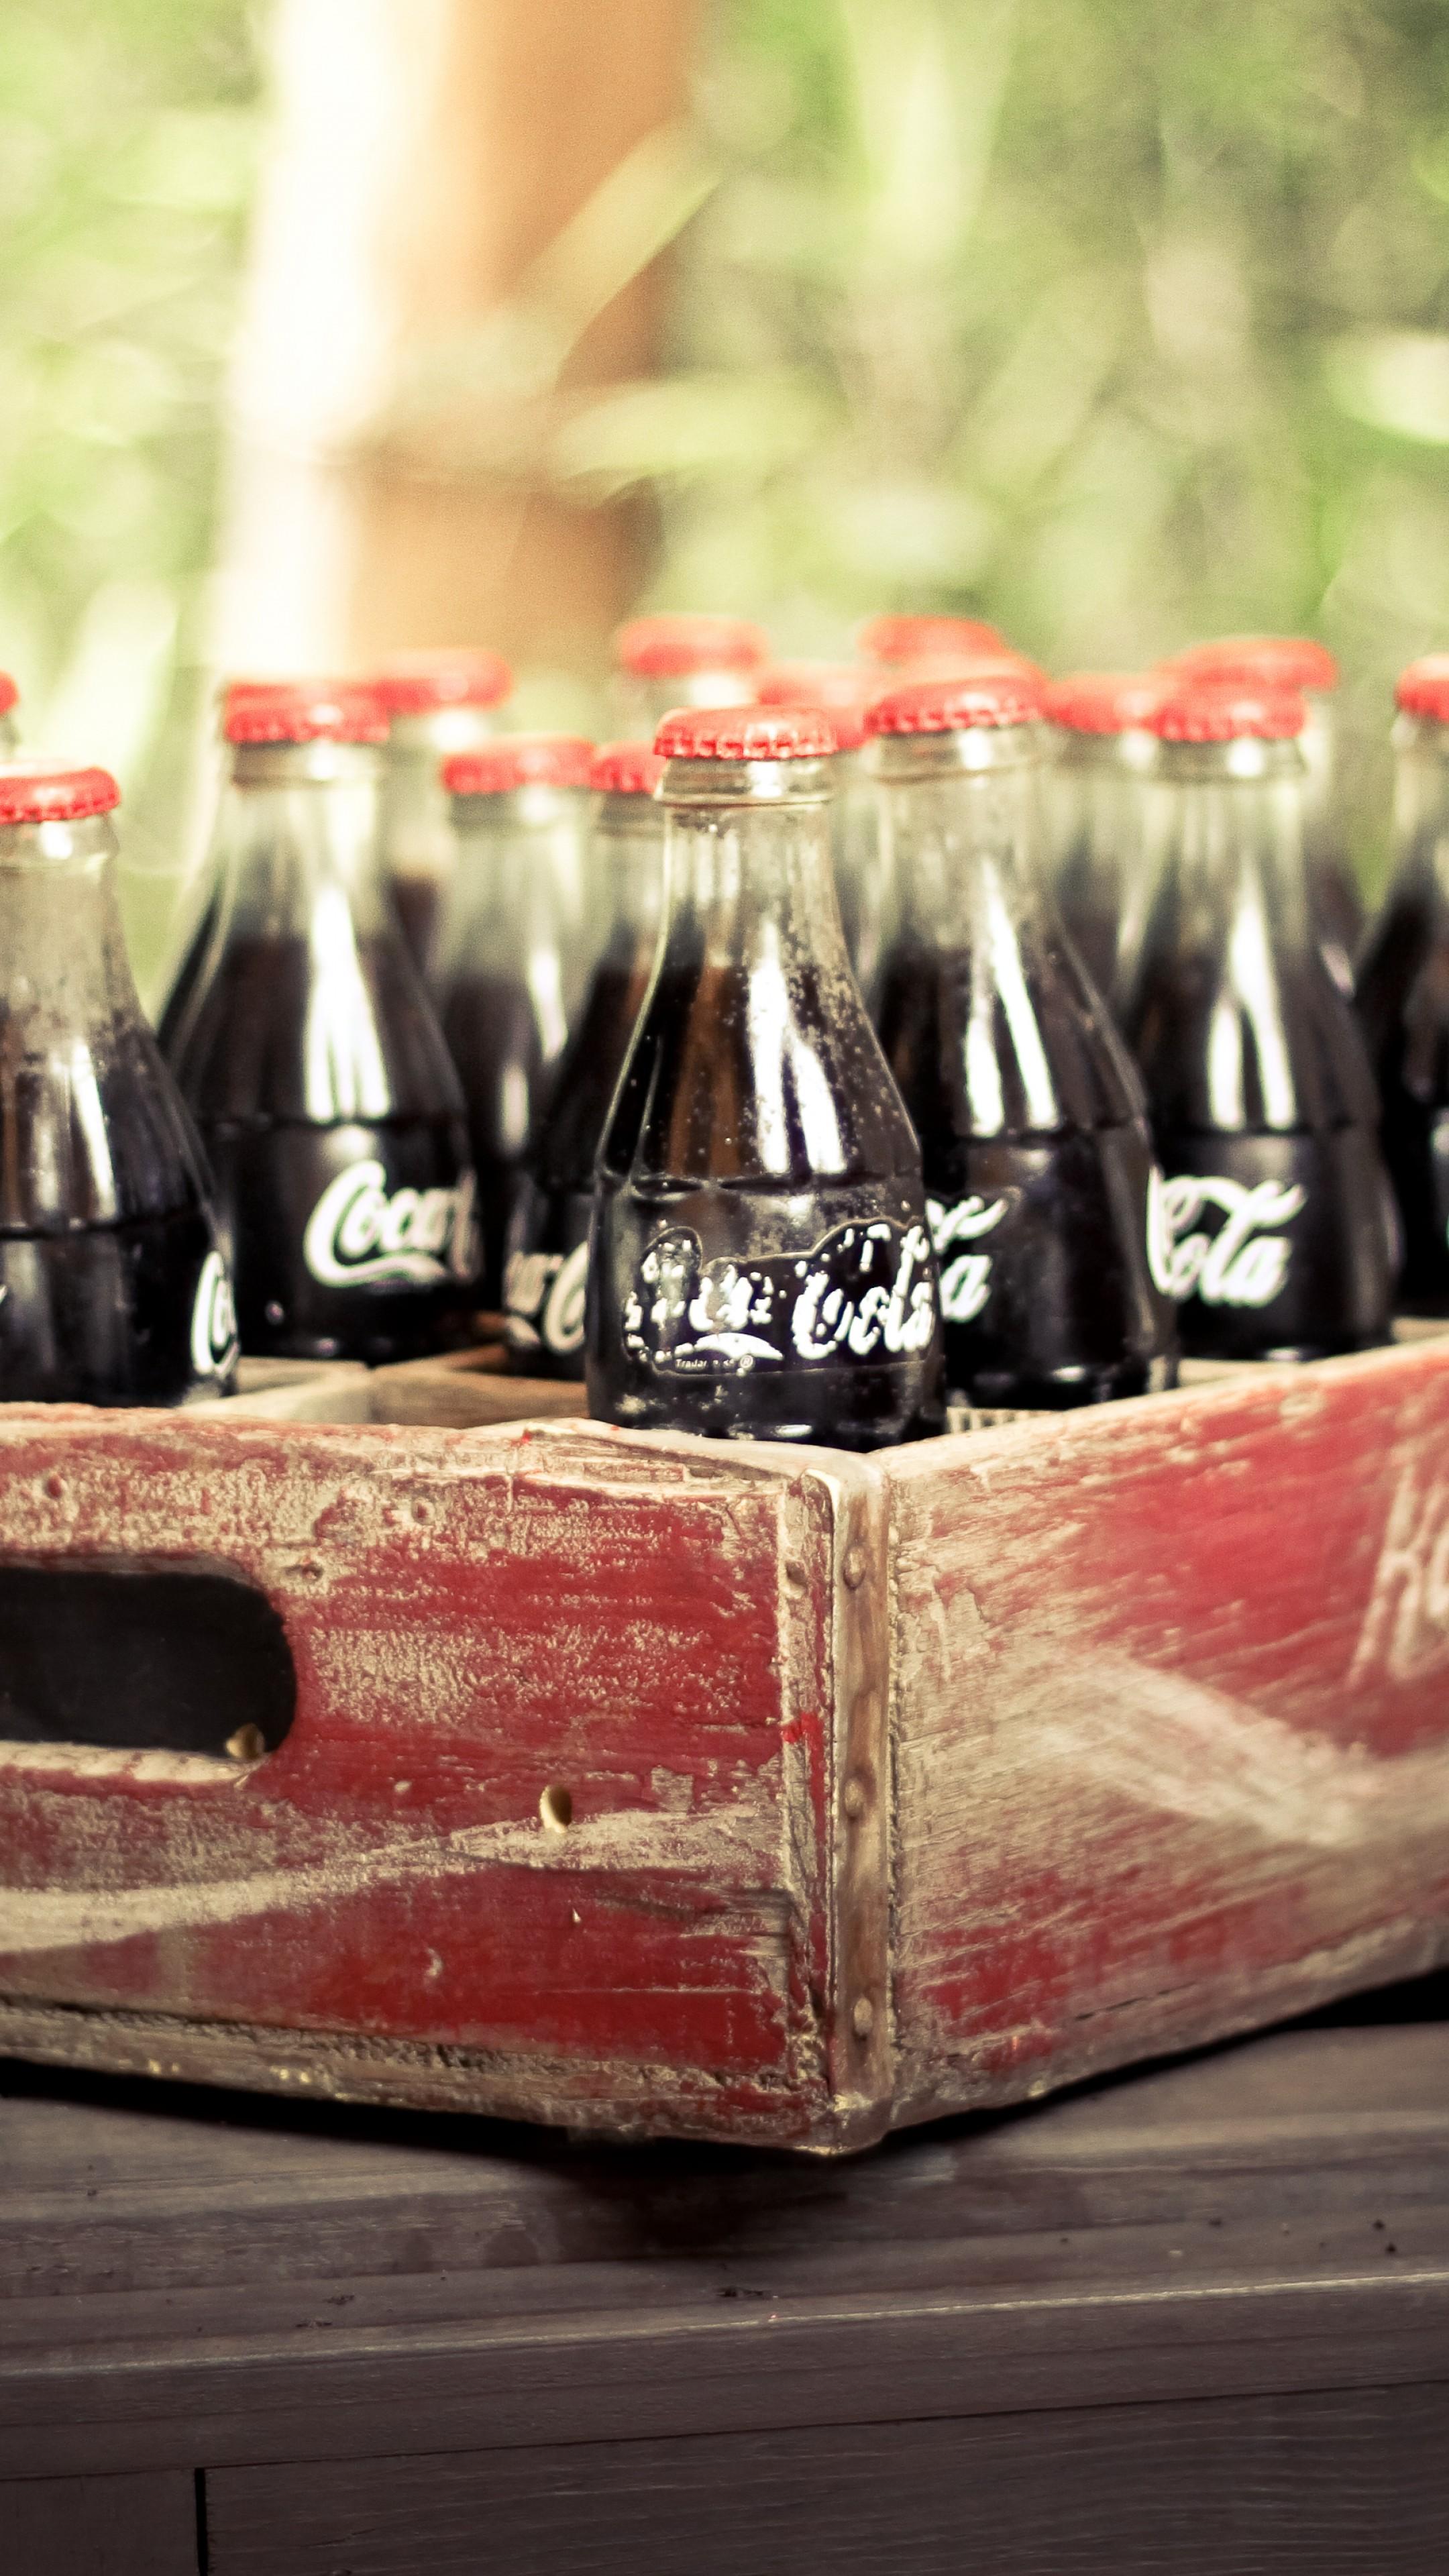 Us Military Wallpaper Quotes Wallpaper Coca Cola Drink Soda Box Vintage Retro